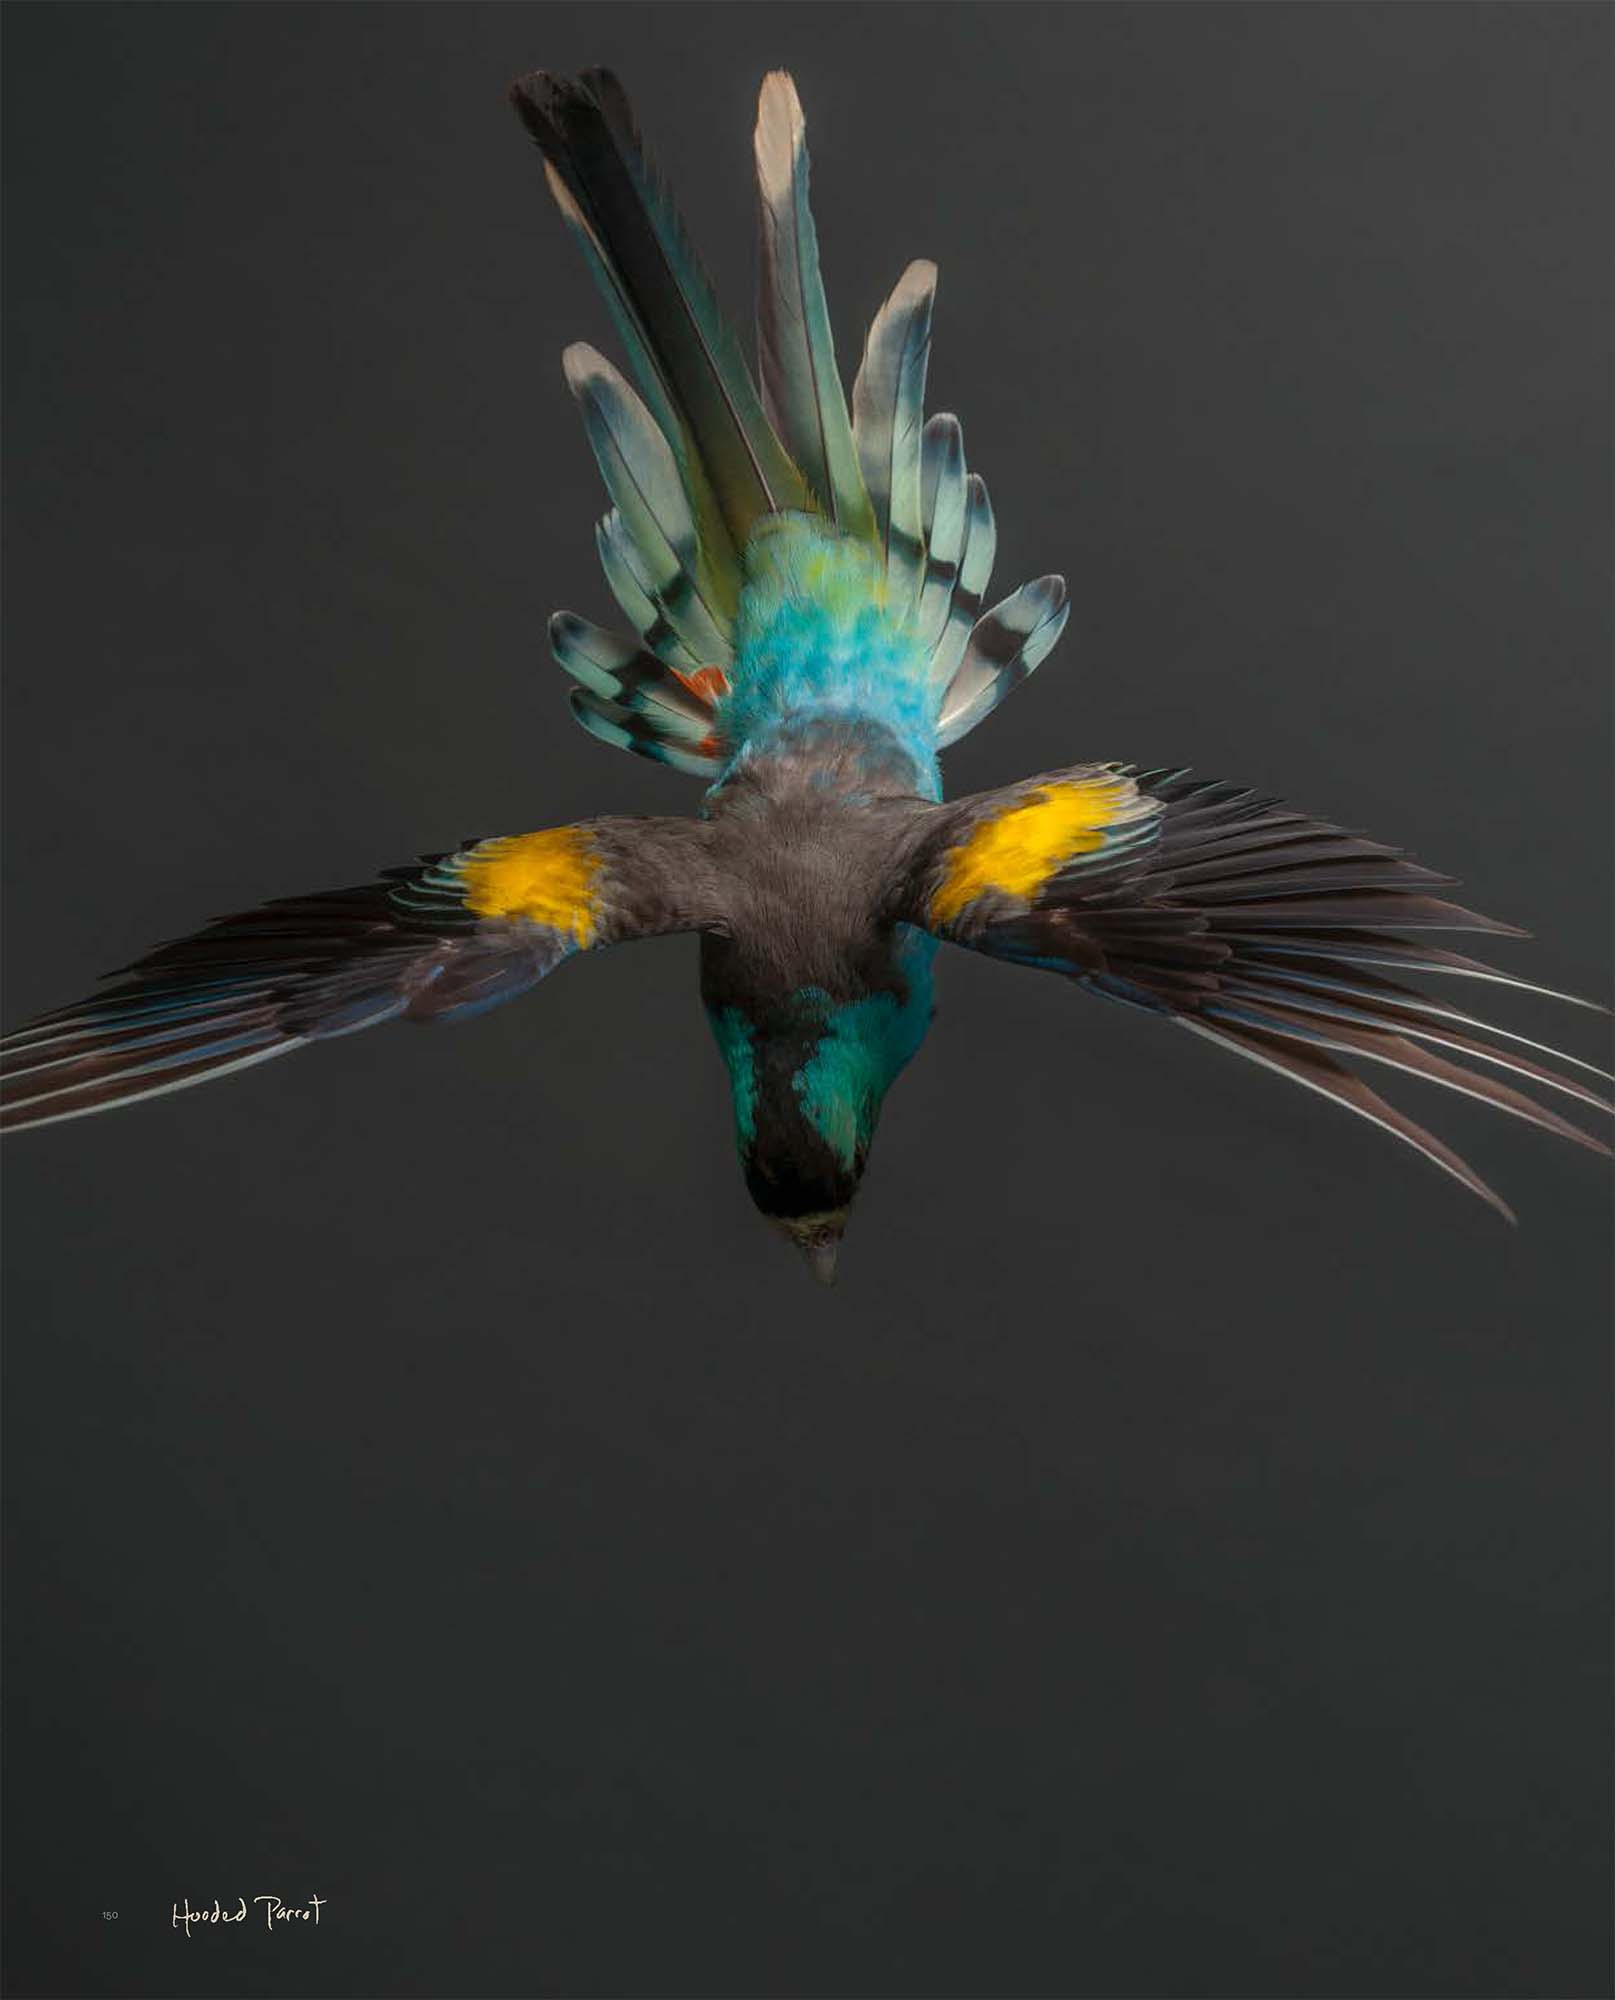 BIRD Gary Heery Book-completemmockup-152.jpg